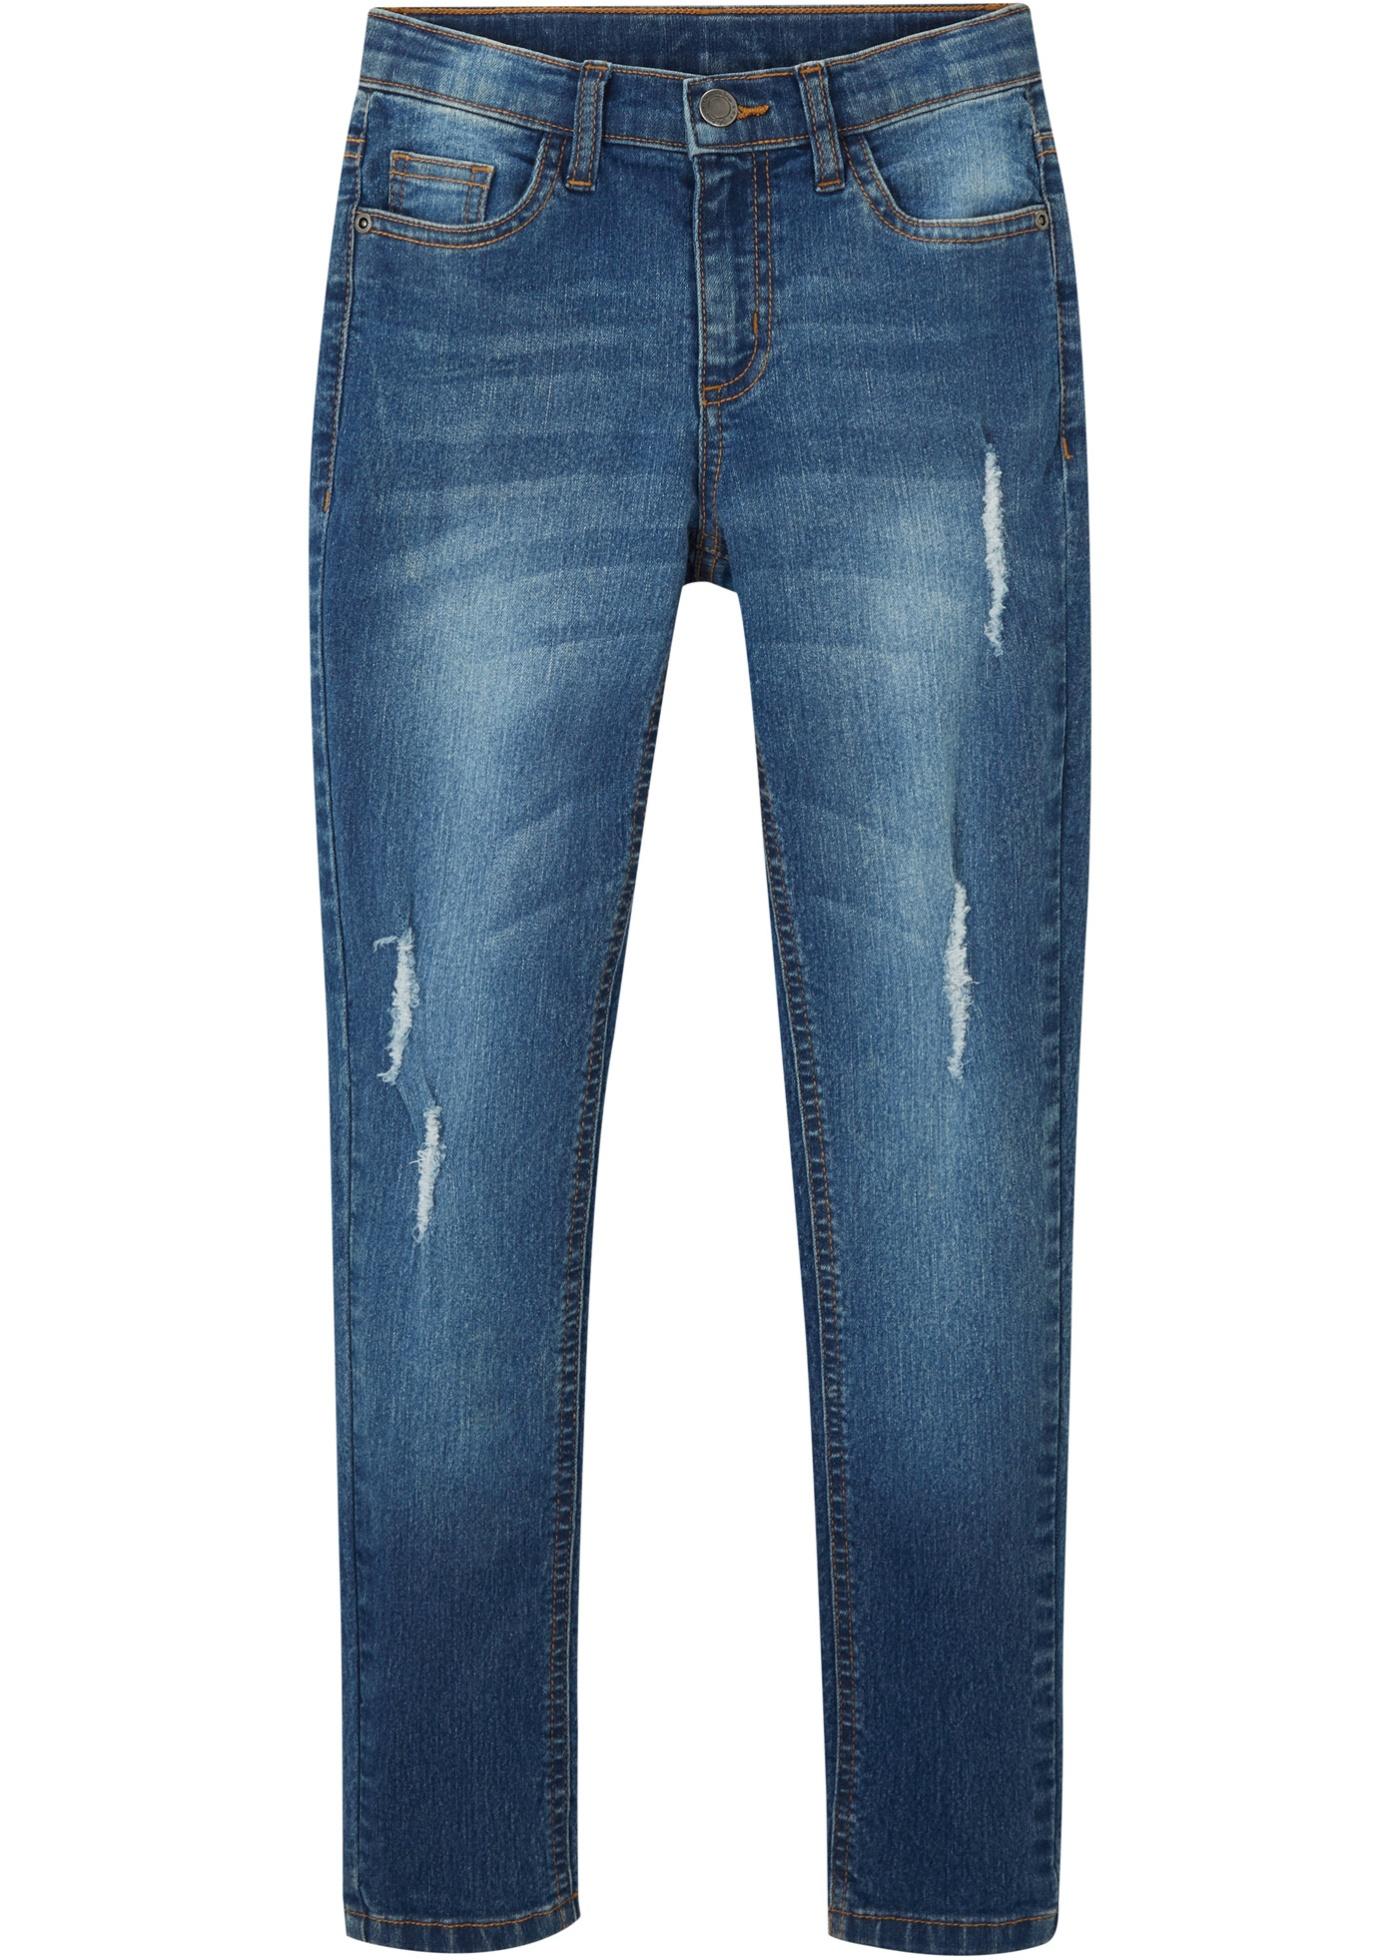 Mädchen Skinny-Jeans